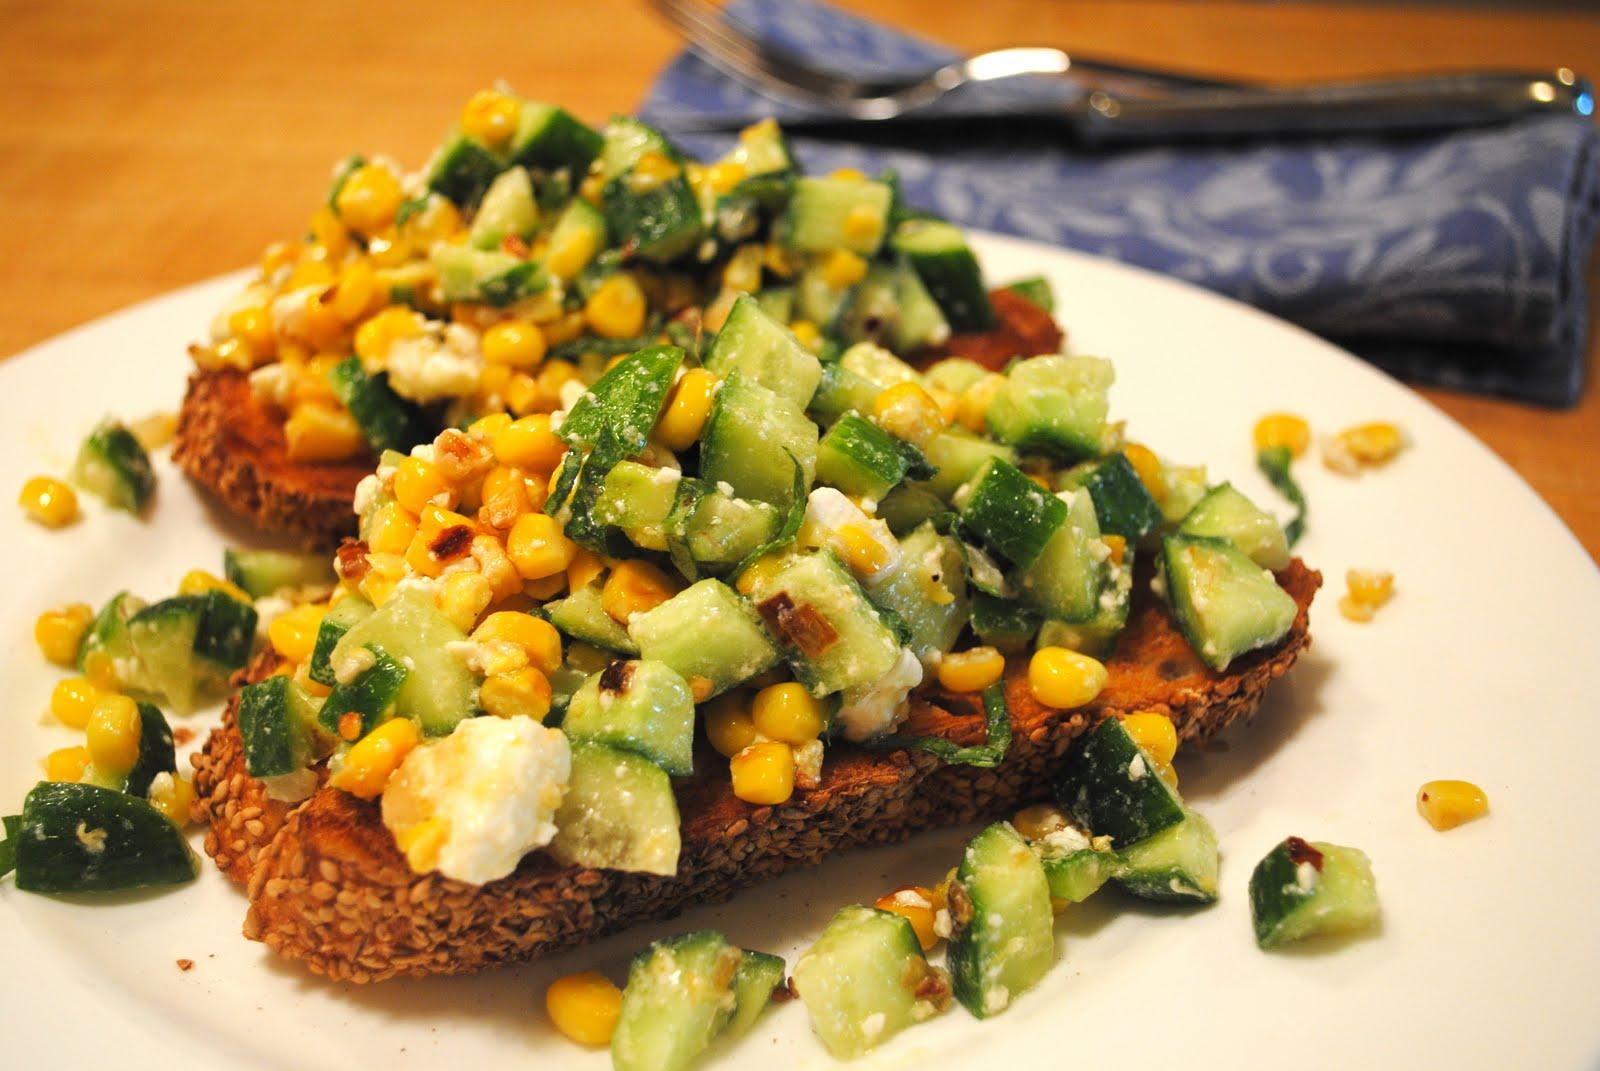 Dorm Room Dinner: Grilled Corn, Cucumber and Feta Salad